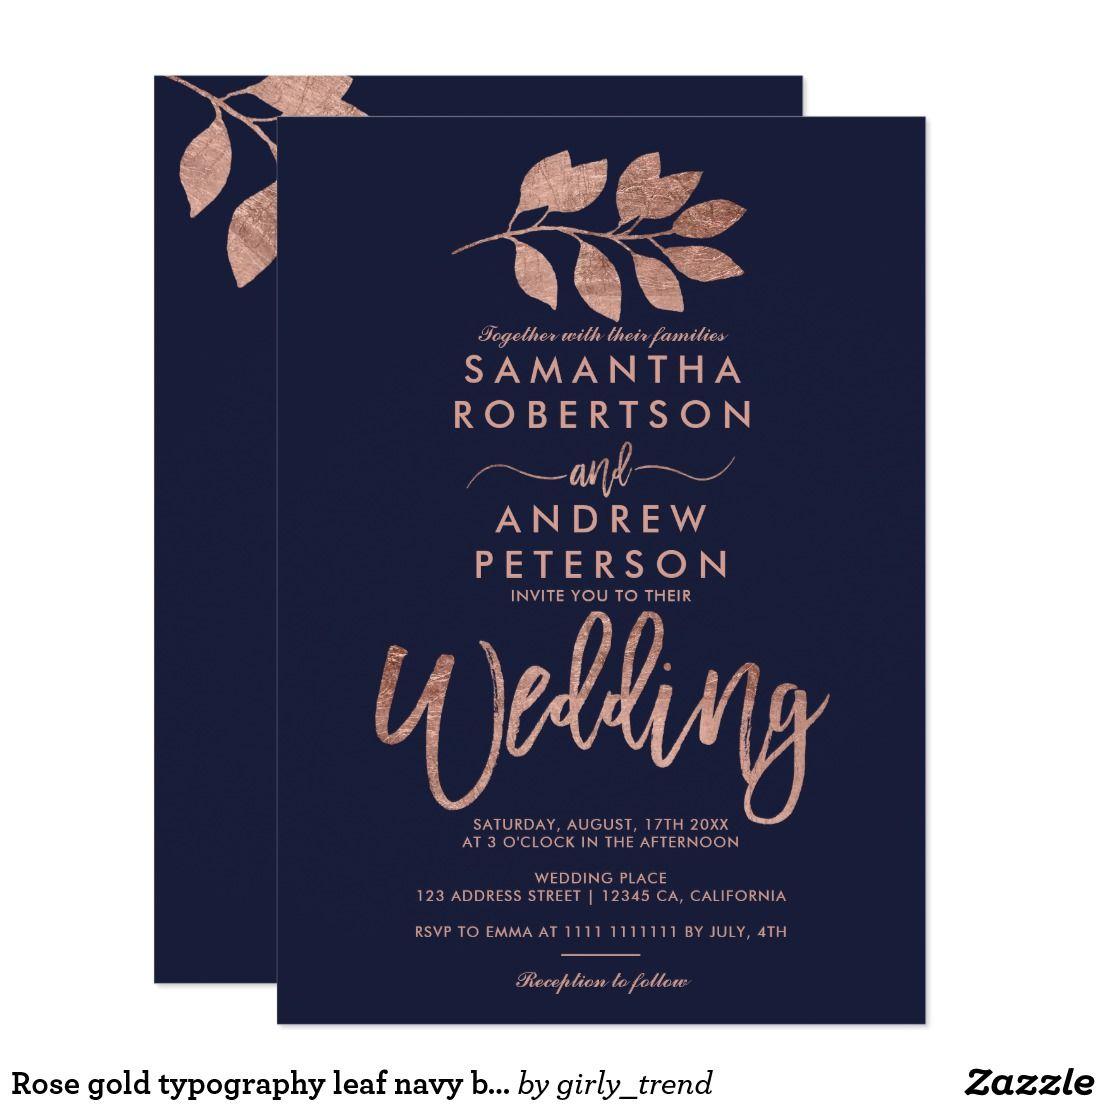 Navy Blue Wedding Invitations Modern: Rose Gold Typography Leaf Navy Blue Wedding Invitation